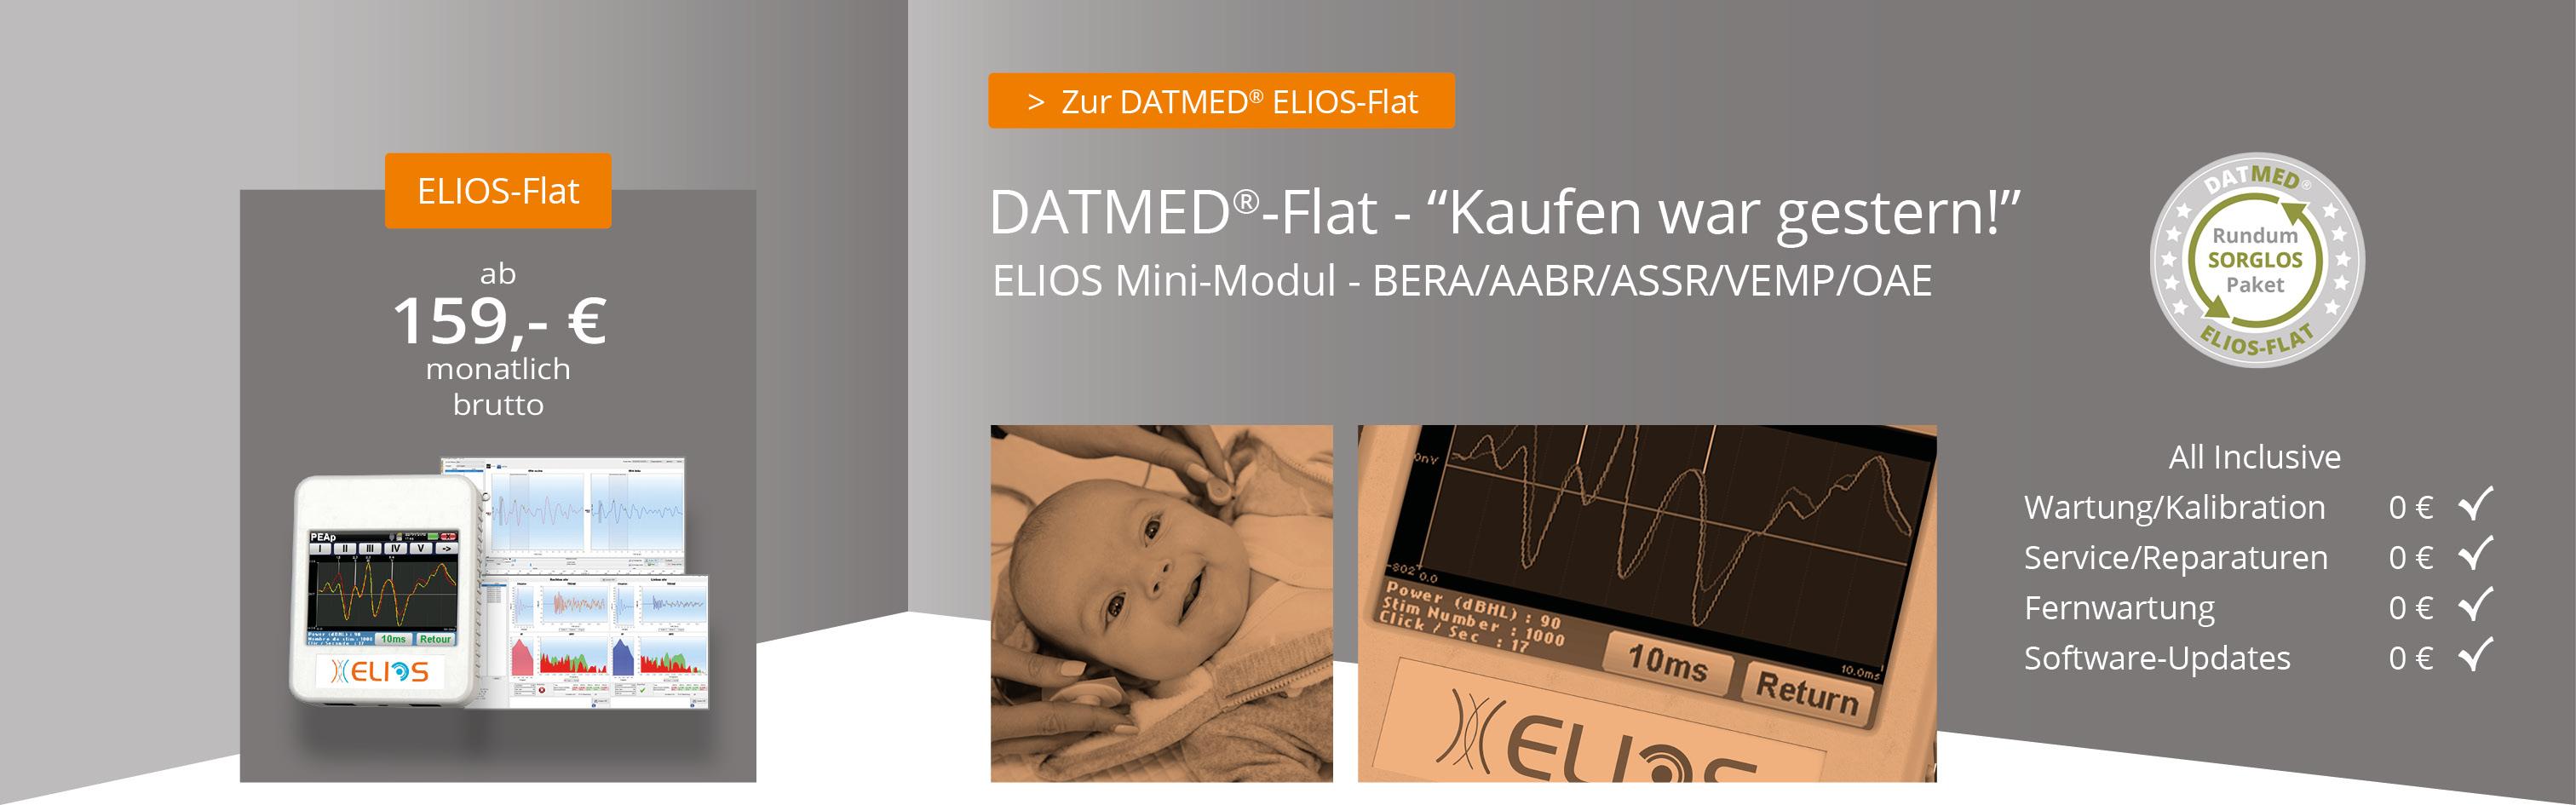 ELIOS-Flat